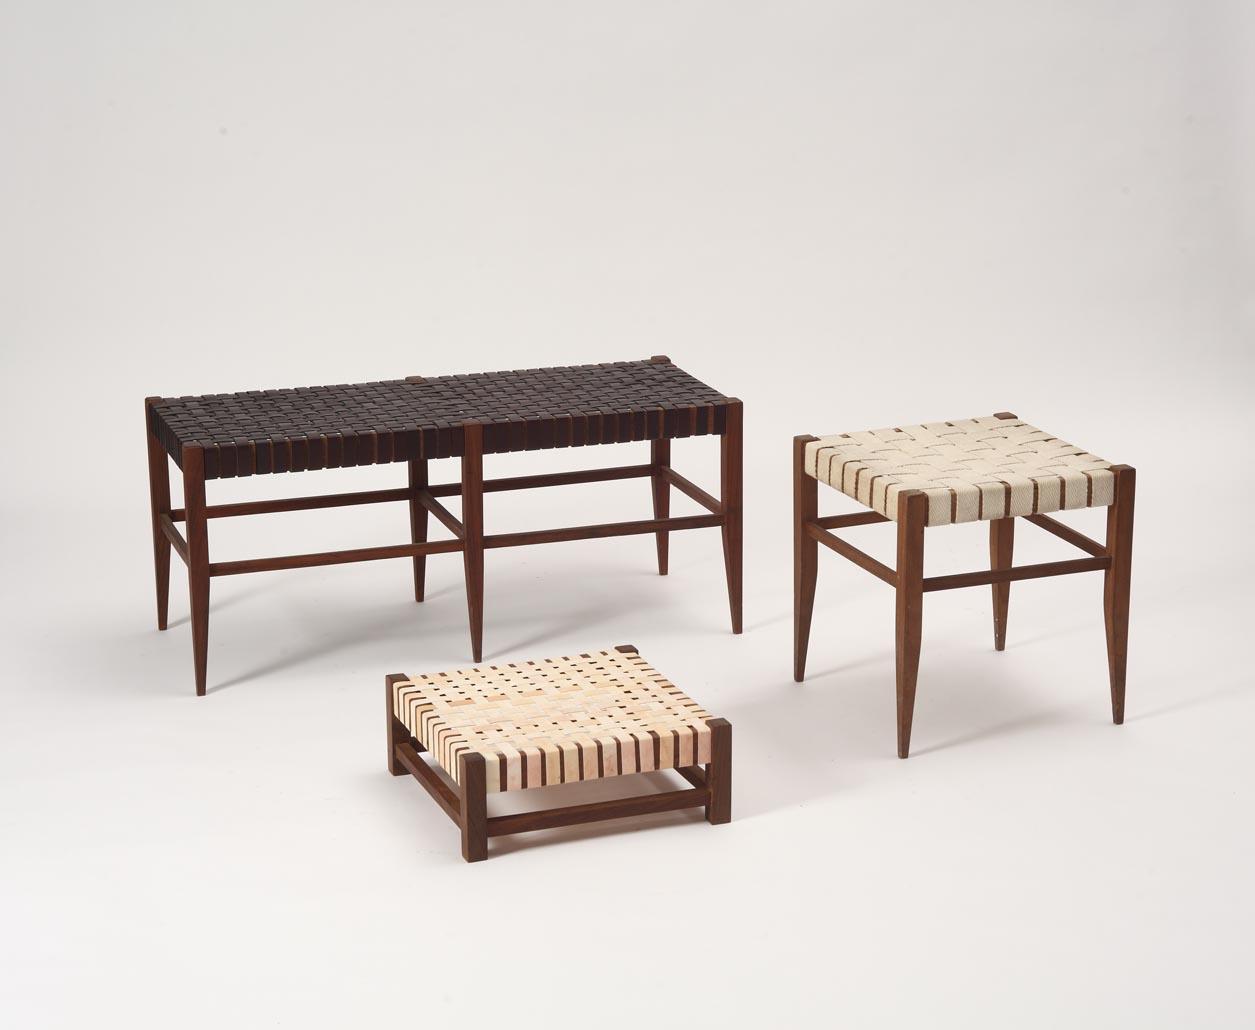 Net muebles - Alejandro Sticotti: Bancos tejidos